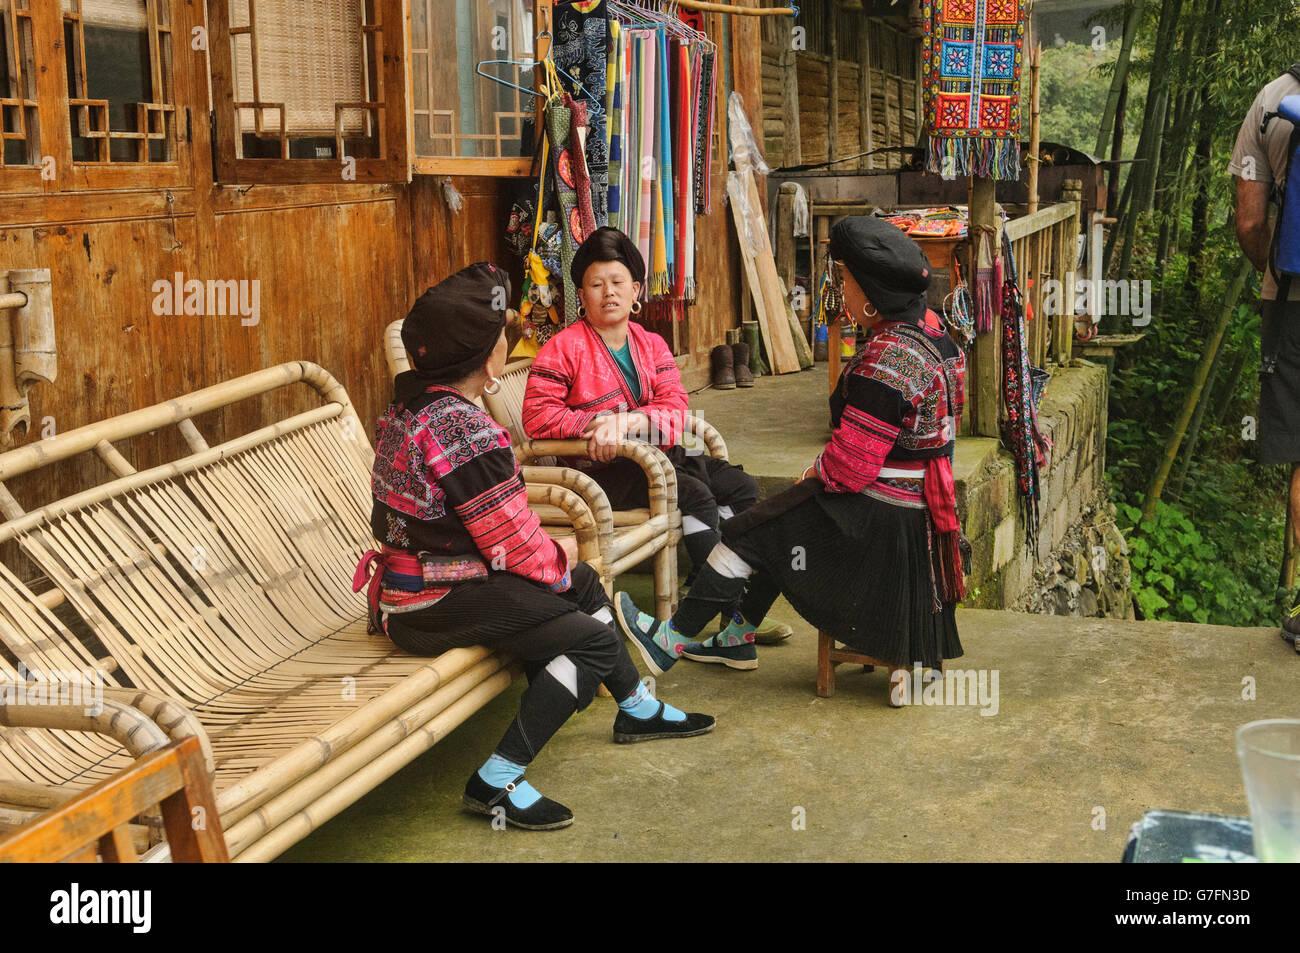 Yao women chatting, Dazhai village, Guangxi Autonomous Region, China Stock Photo